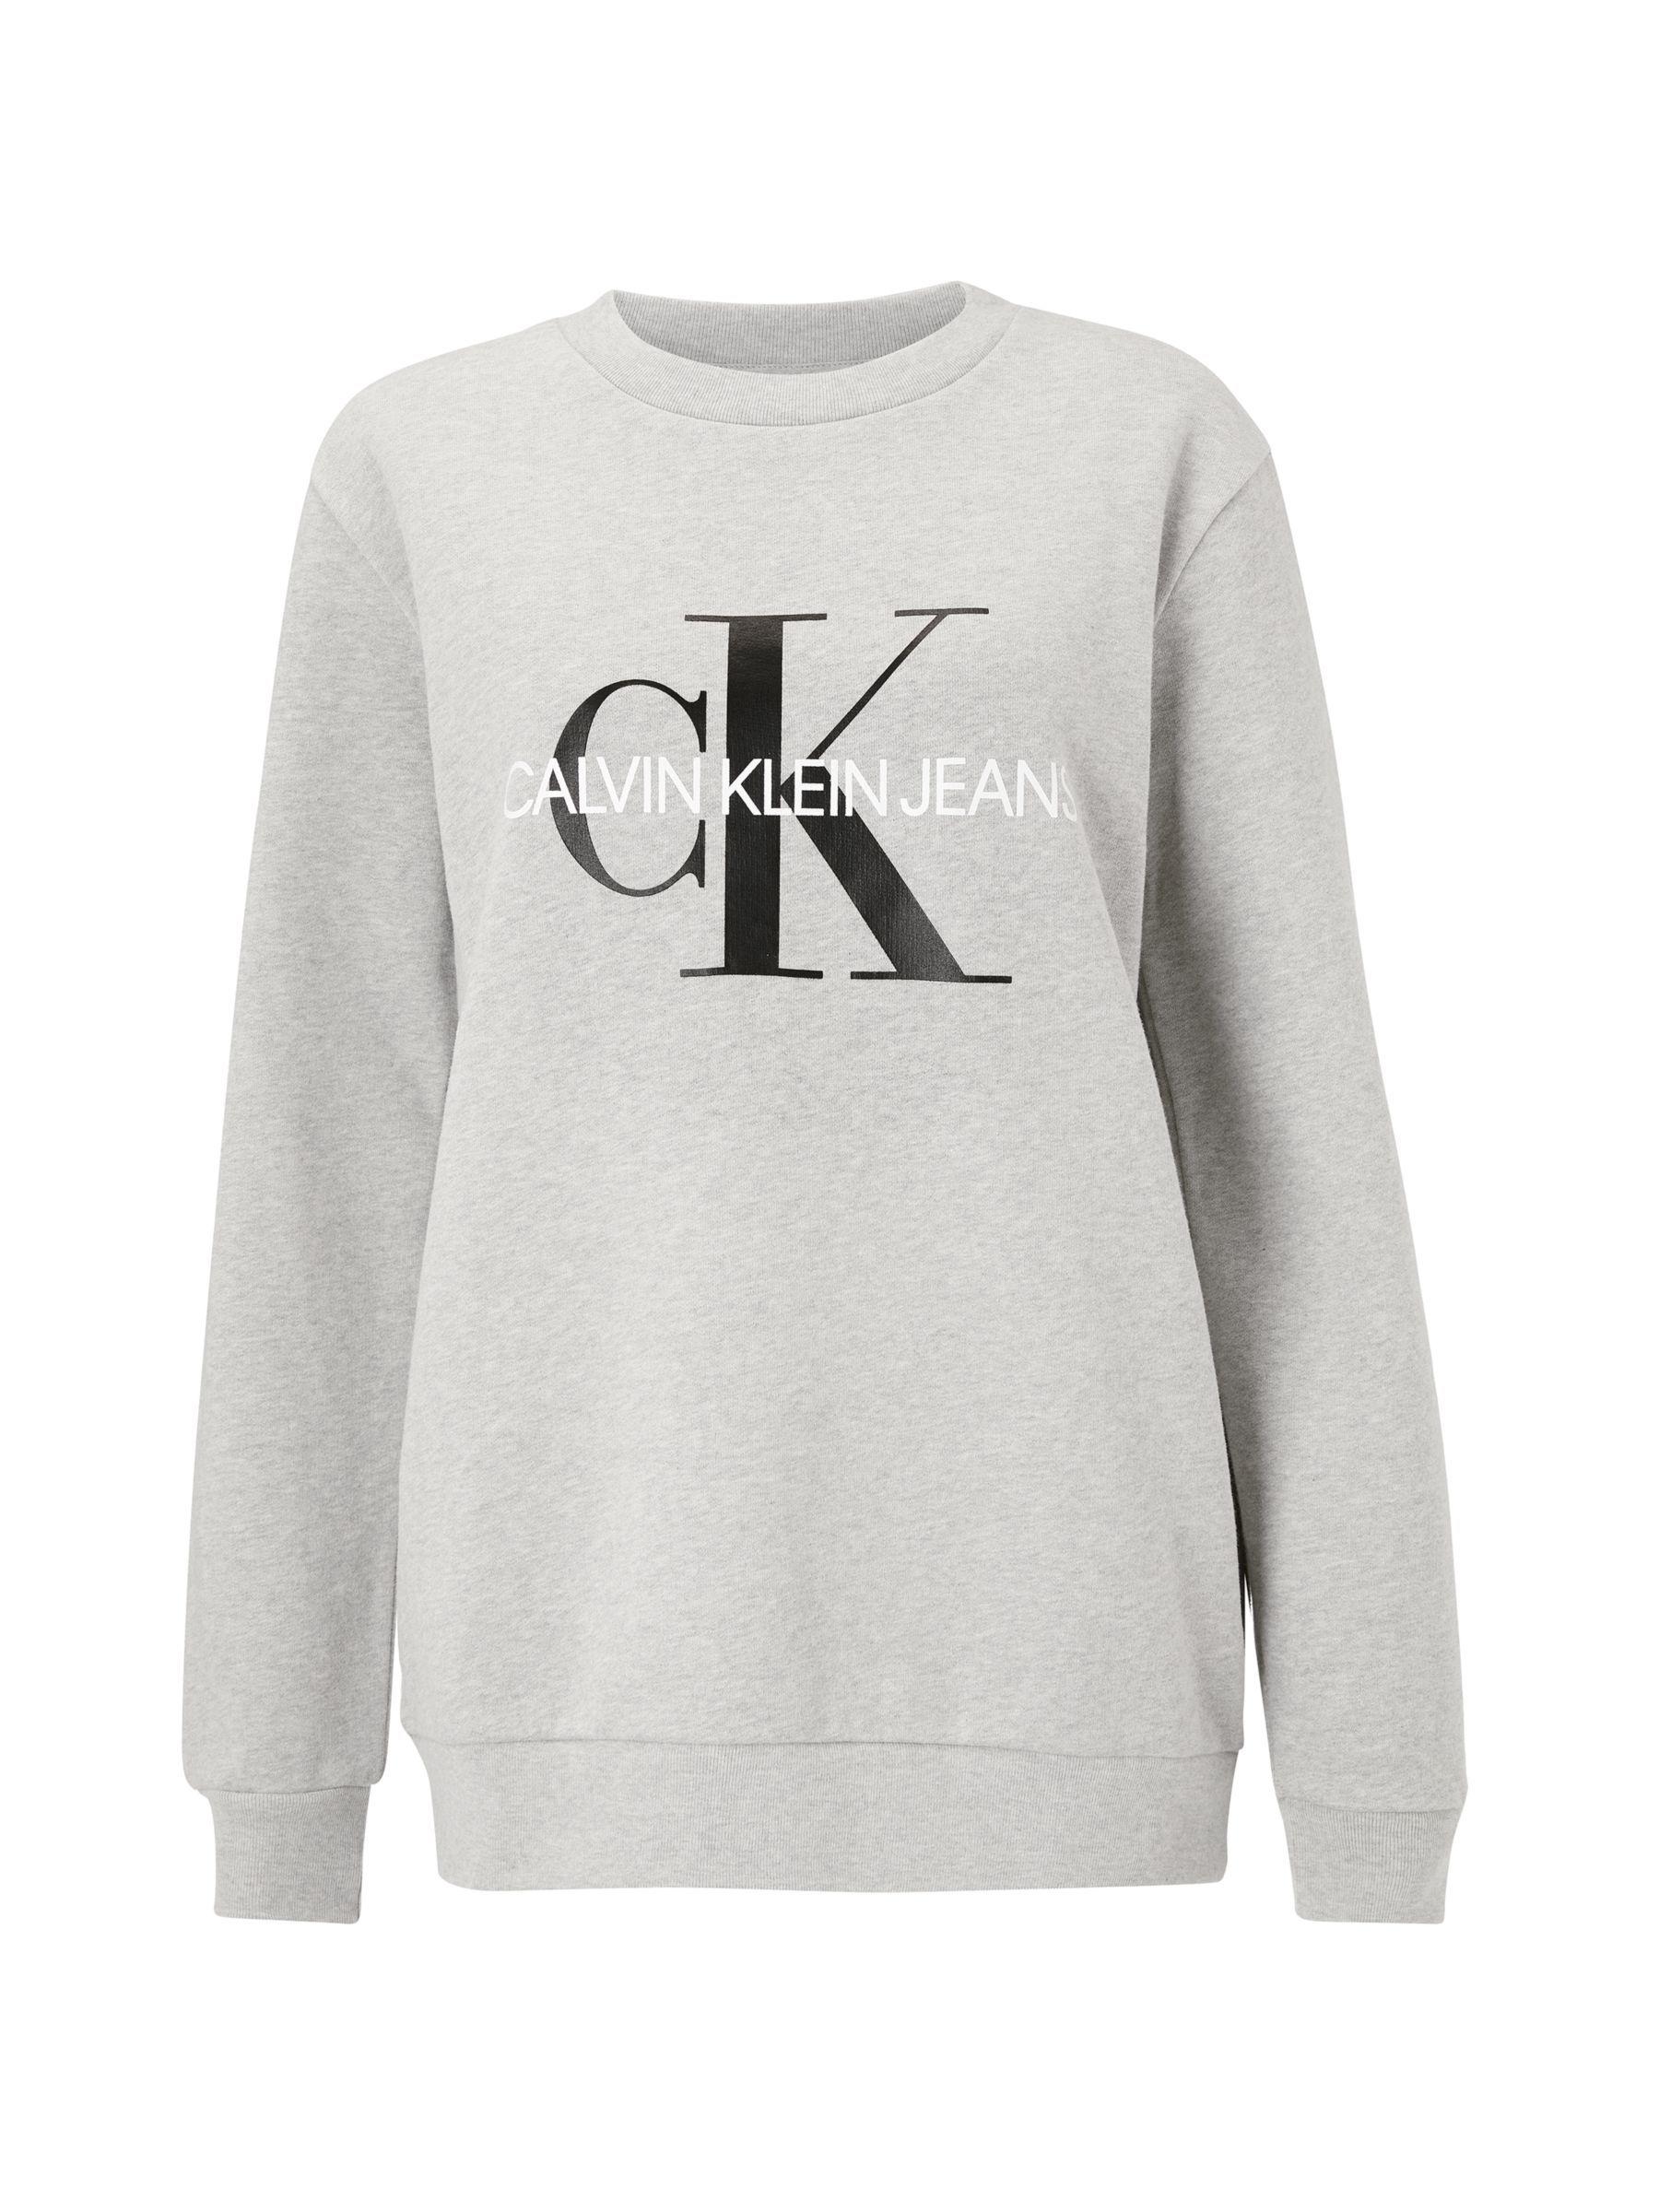 Womens Sweatshirts & Sweaters Calvin